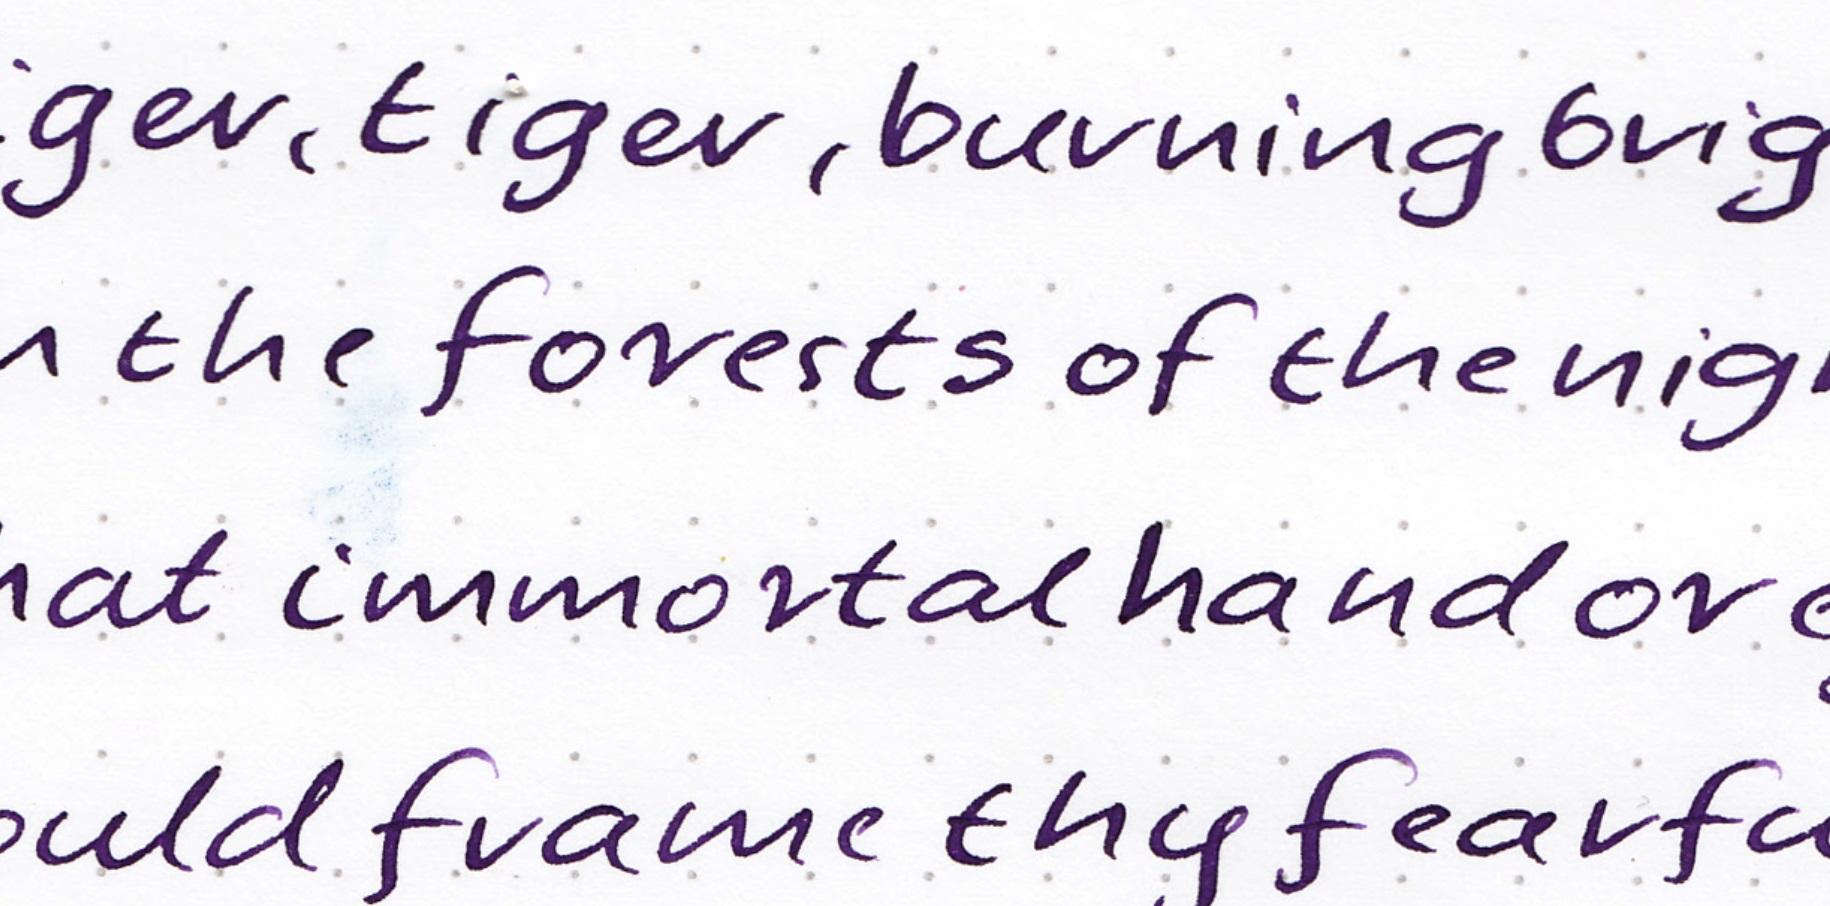 fpn_1455051605__violet_stdupont_rhodia_2